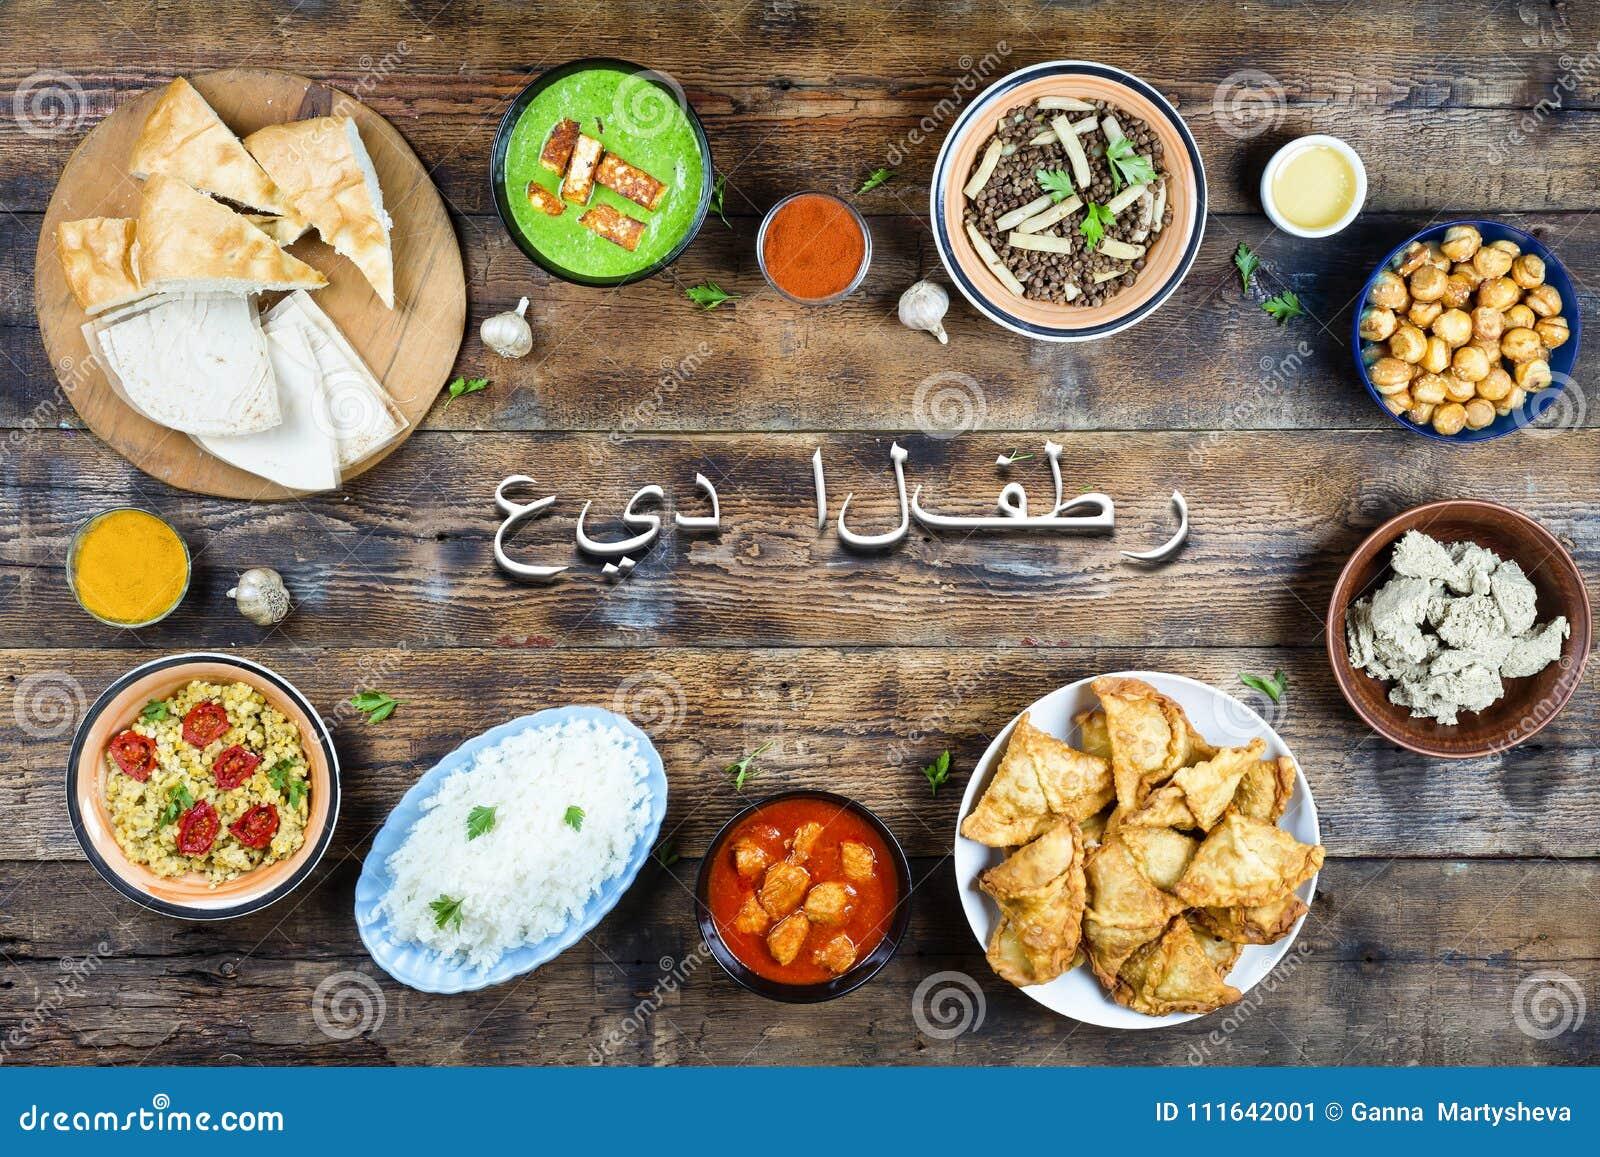 Pakistani cuisine bangladesh cuisine banner copy space eid a download comp forumfinder Image collections